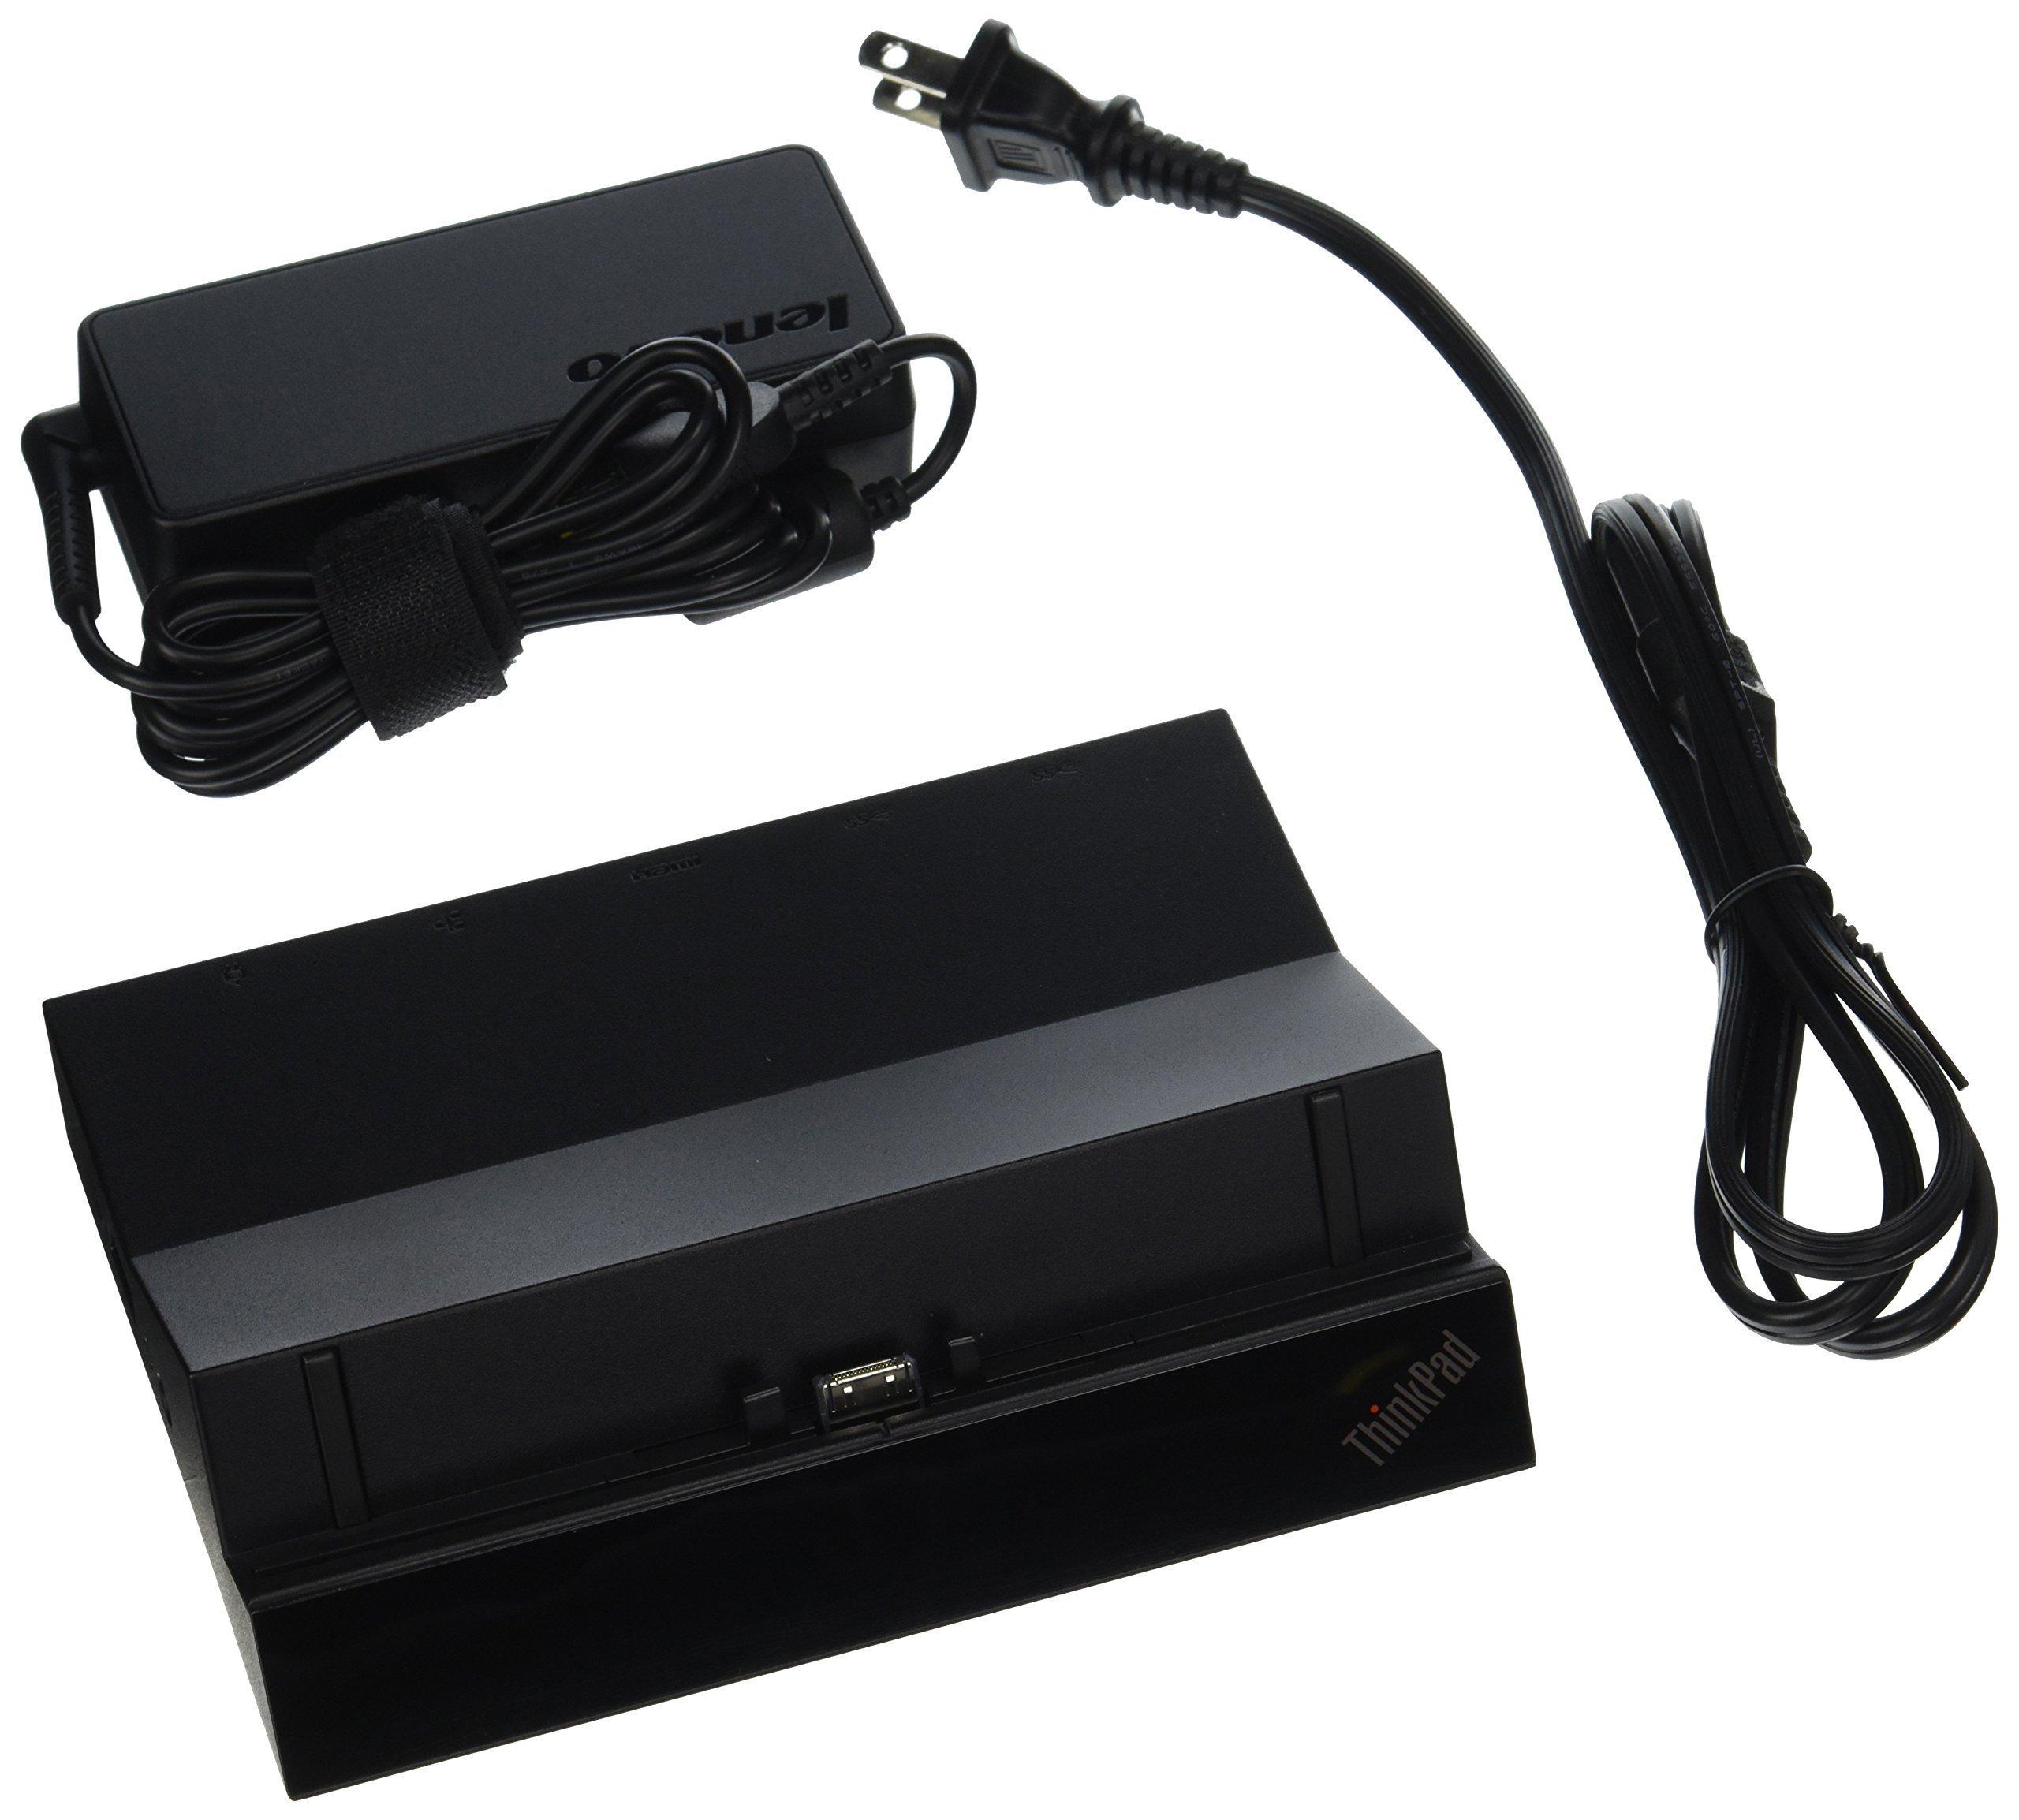 Lenovo ThinkPad Tablet Dock - Docking Station 4X10H03962 (Renewed)